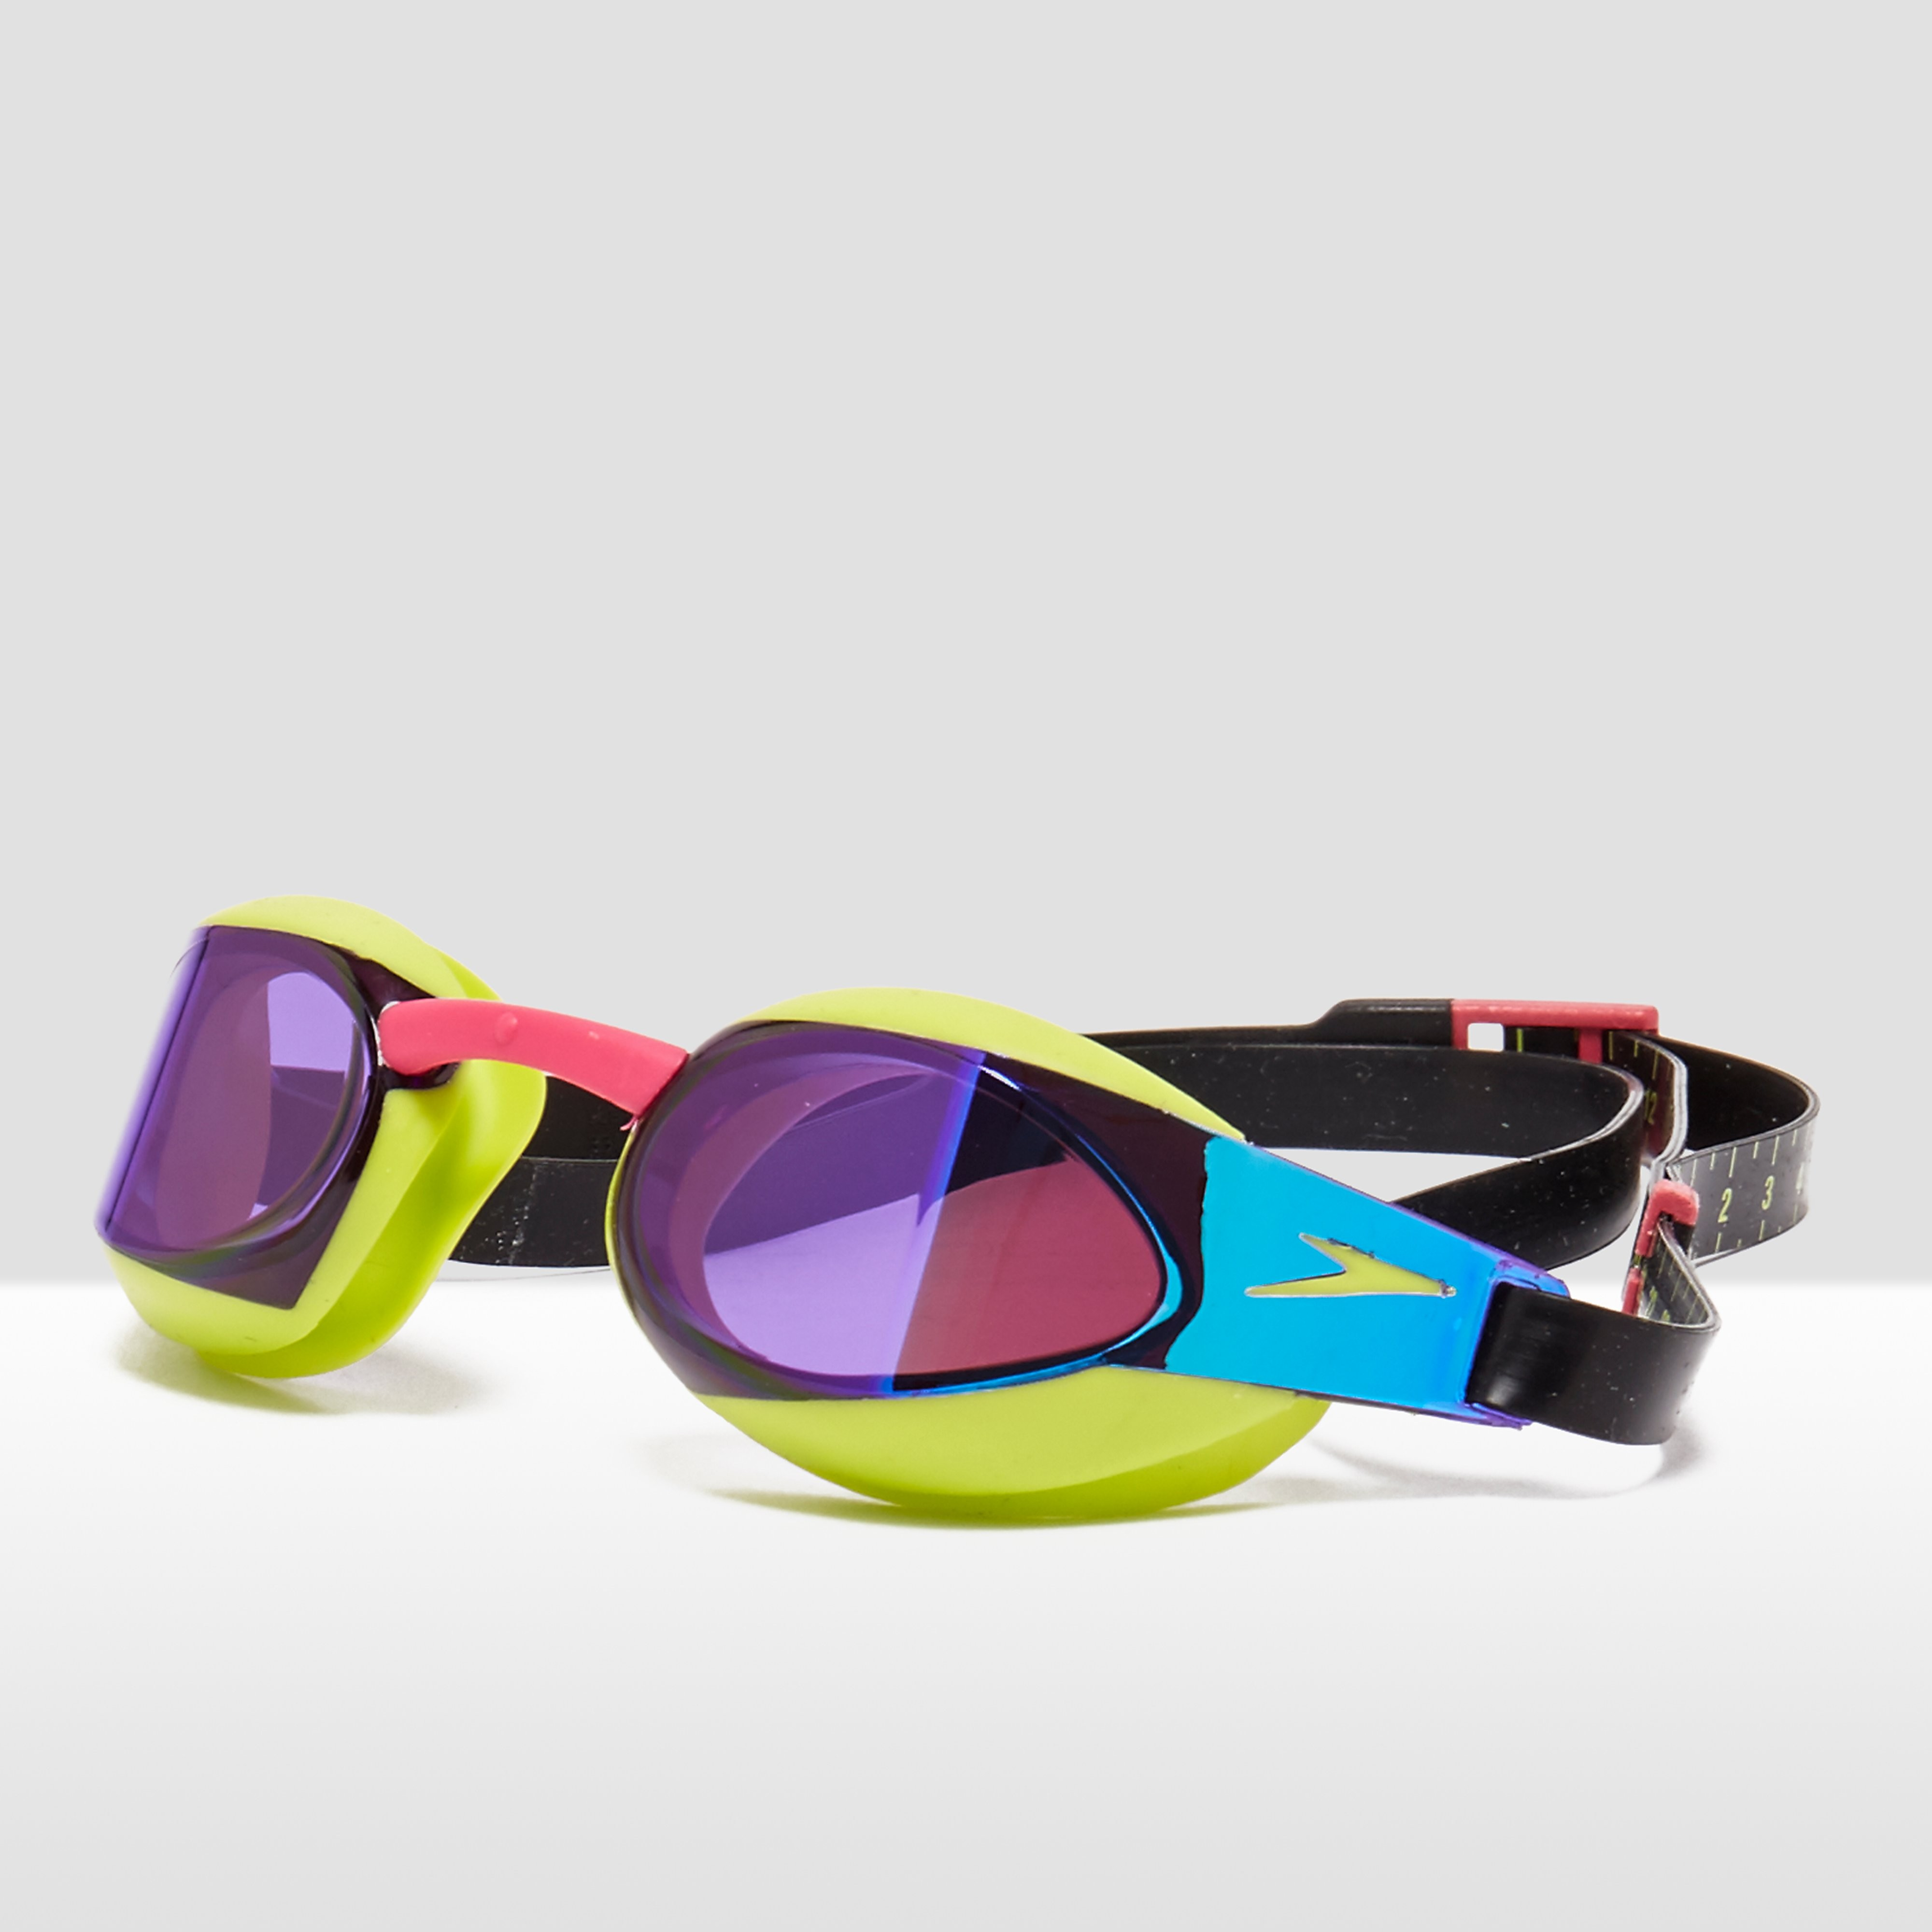 Speedo Fastskin Elite Mirror Swimming Goggles